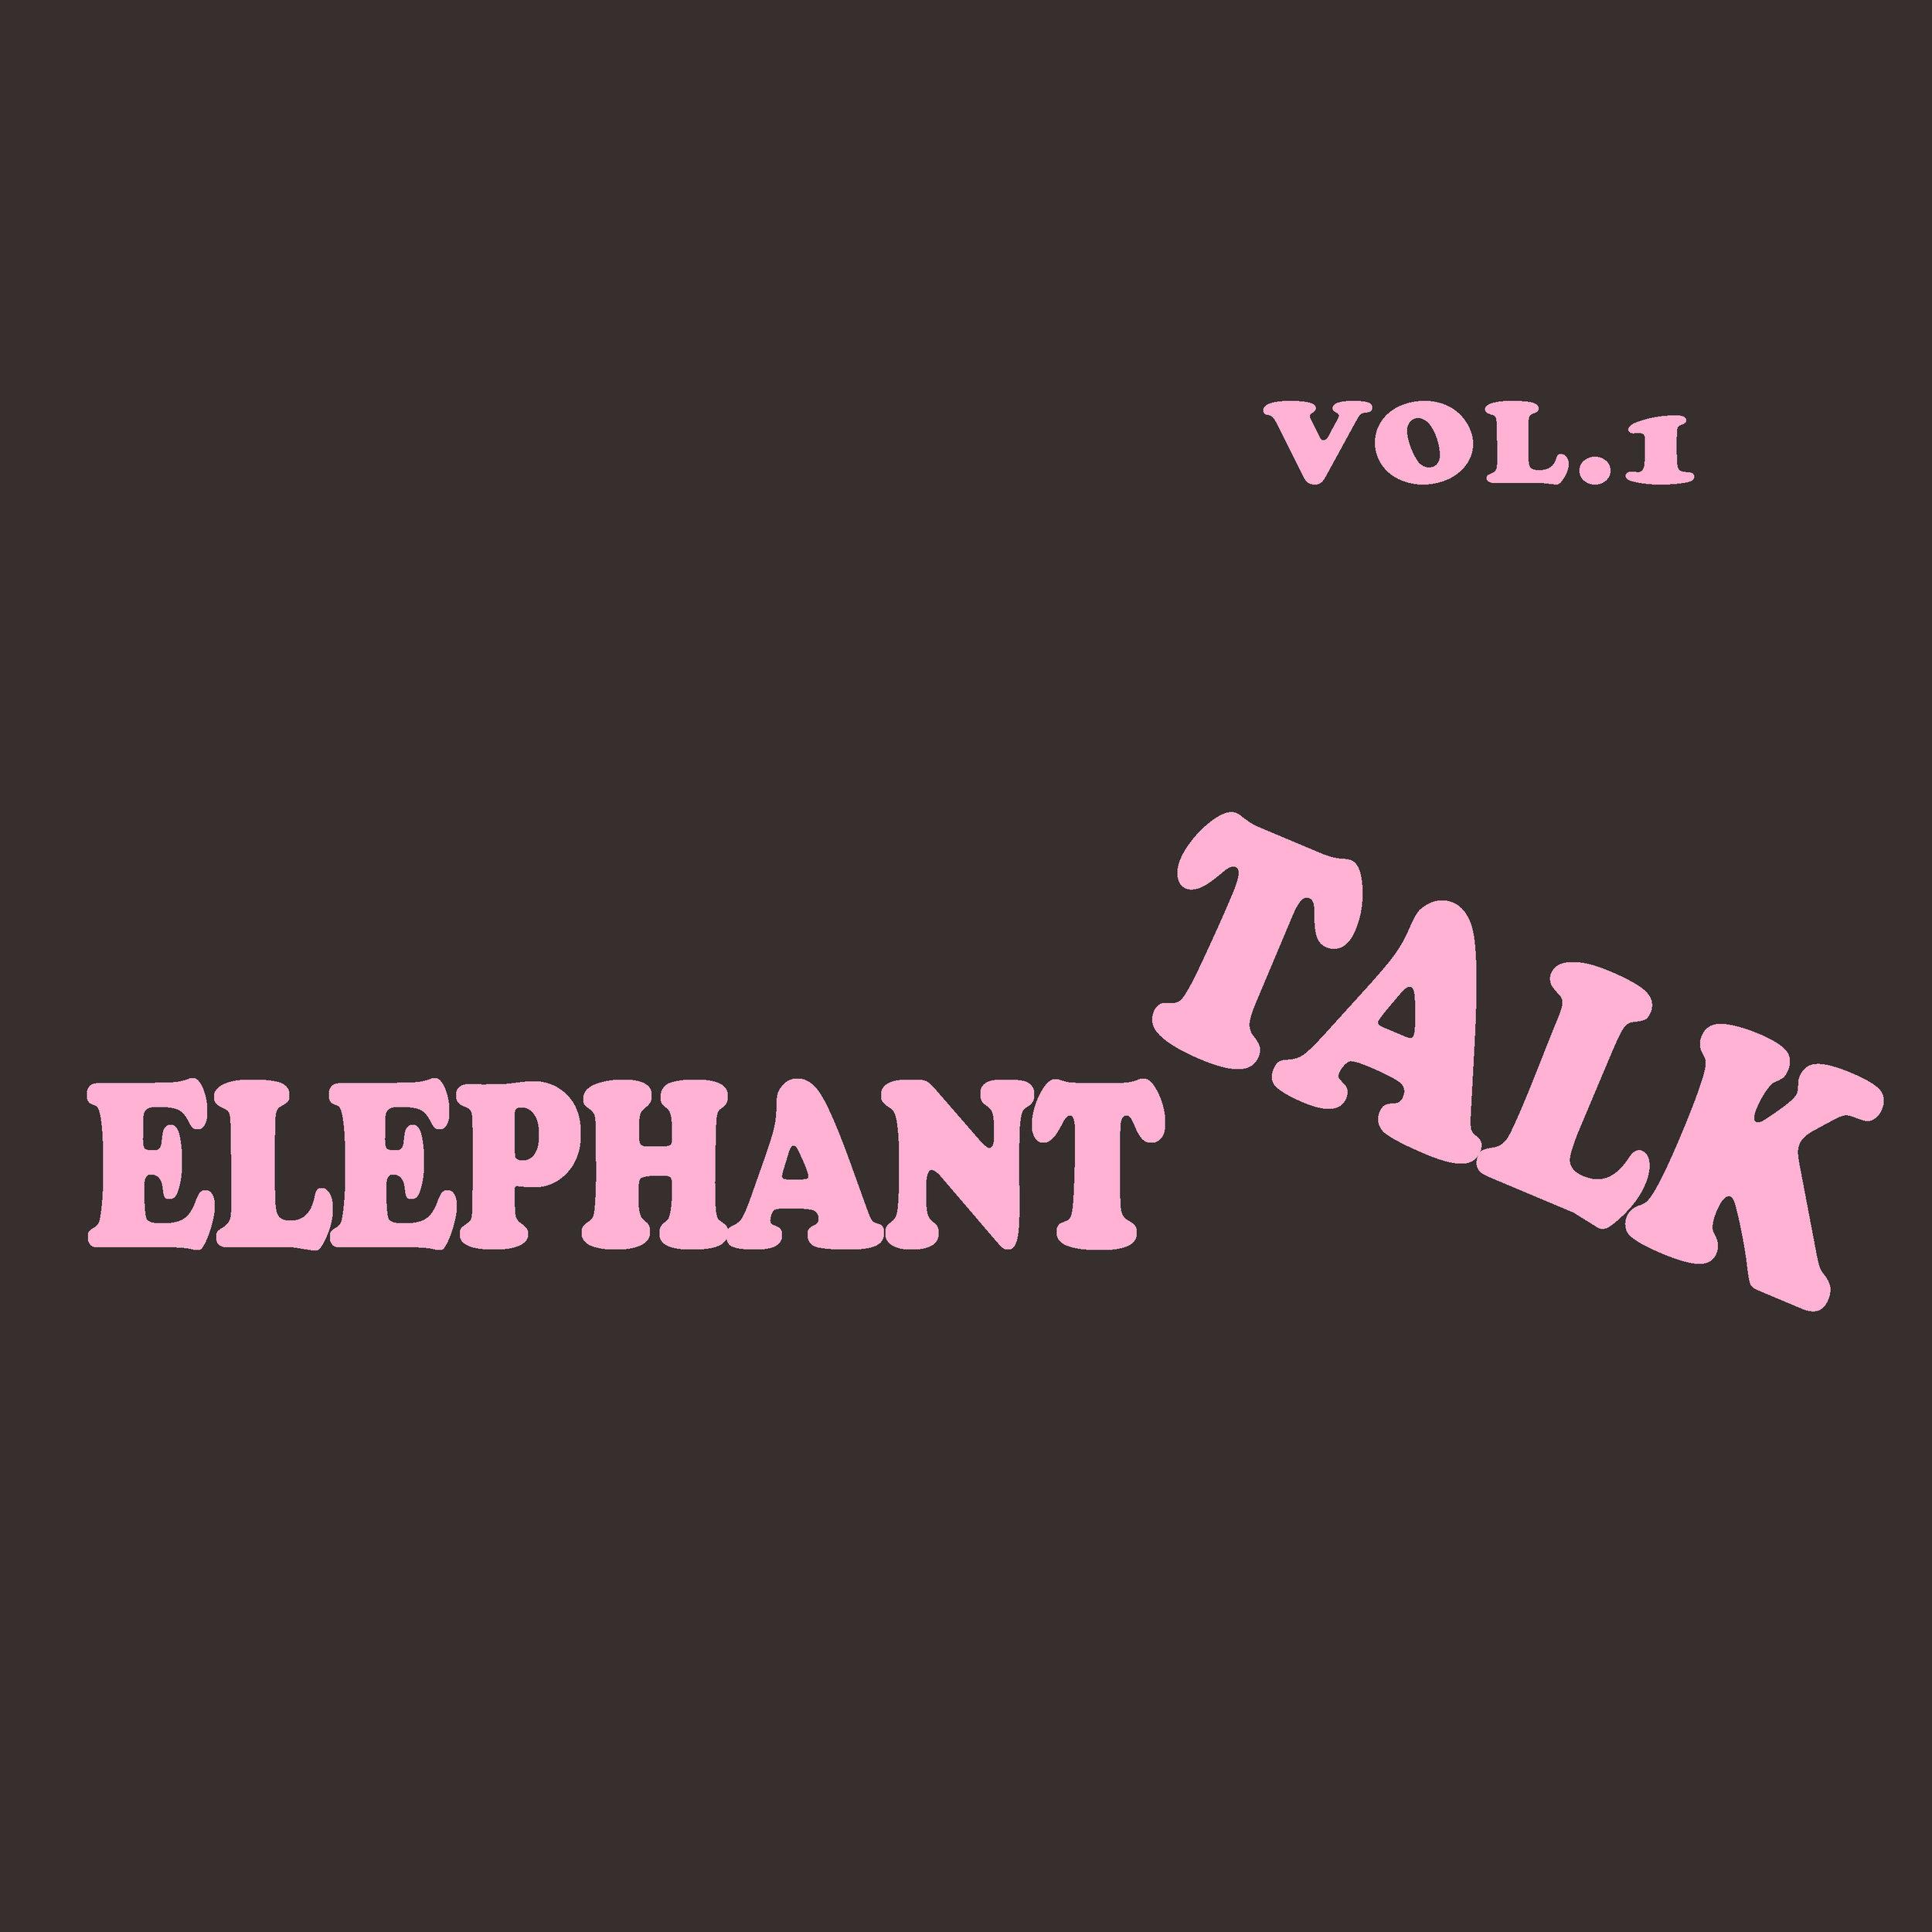 ElephantTalk.Vol1.jpg